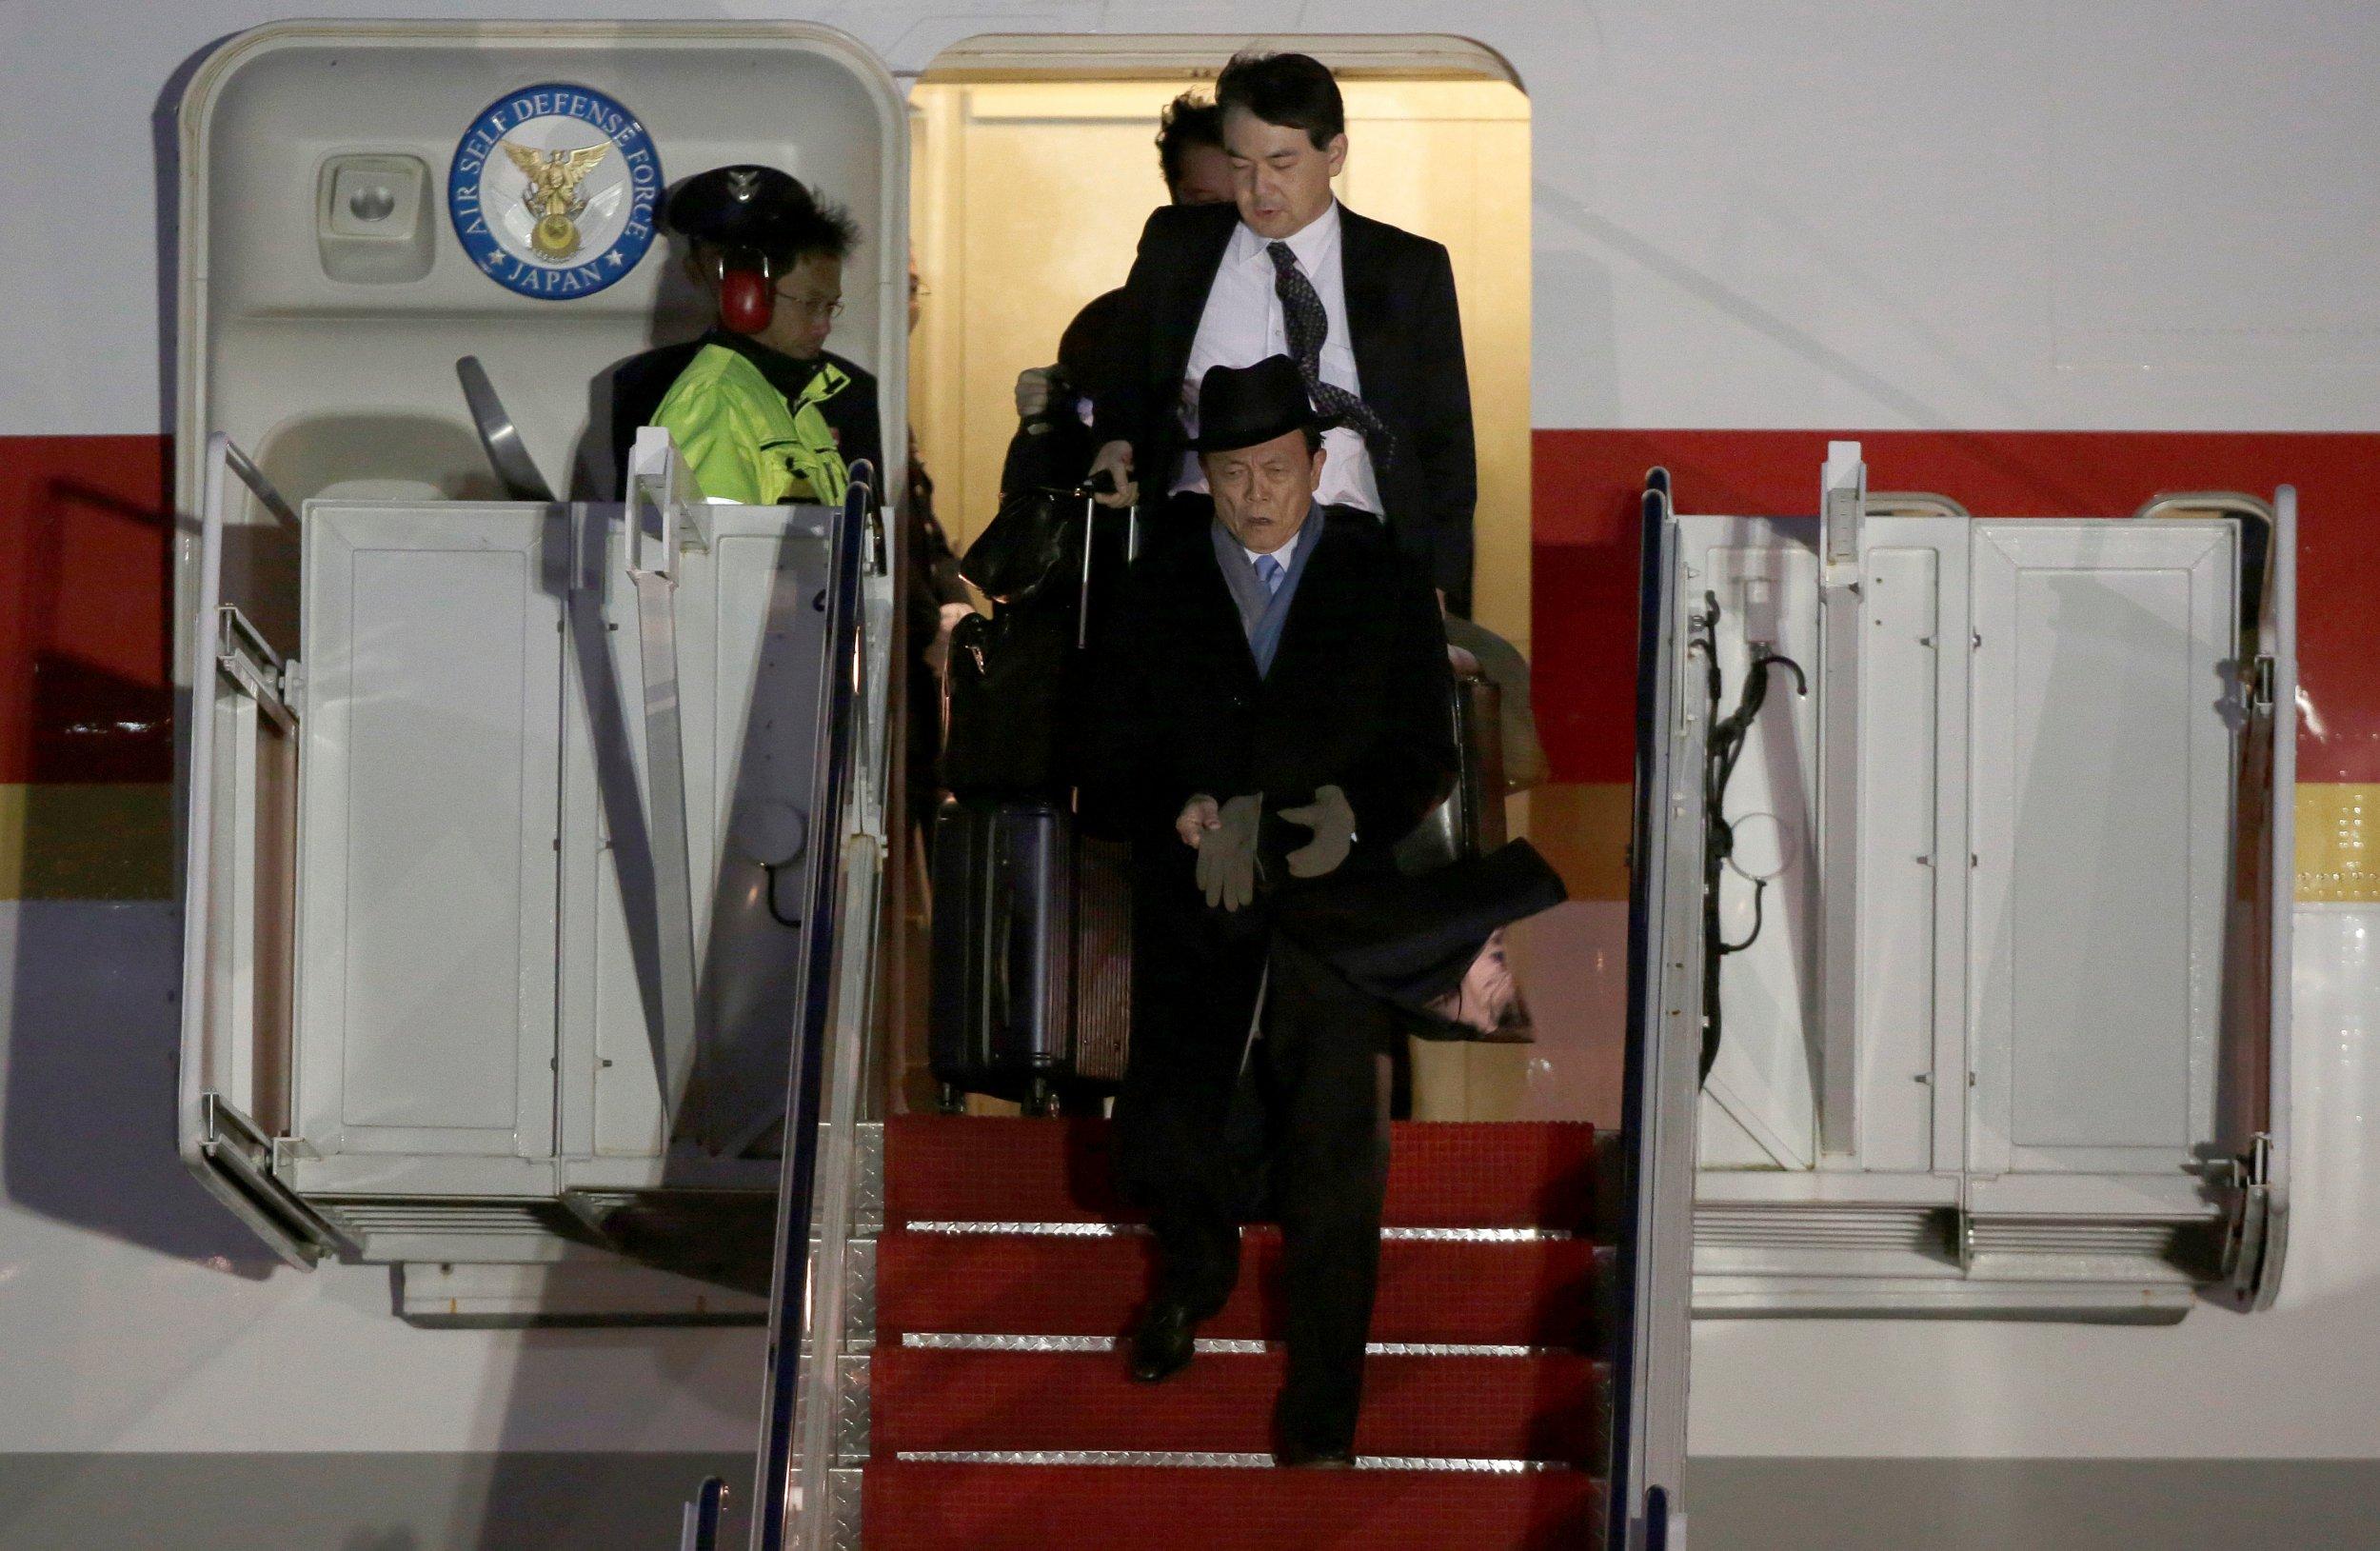 Abe leaves plane to meet Trump